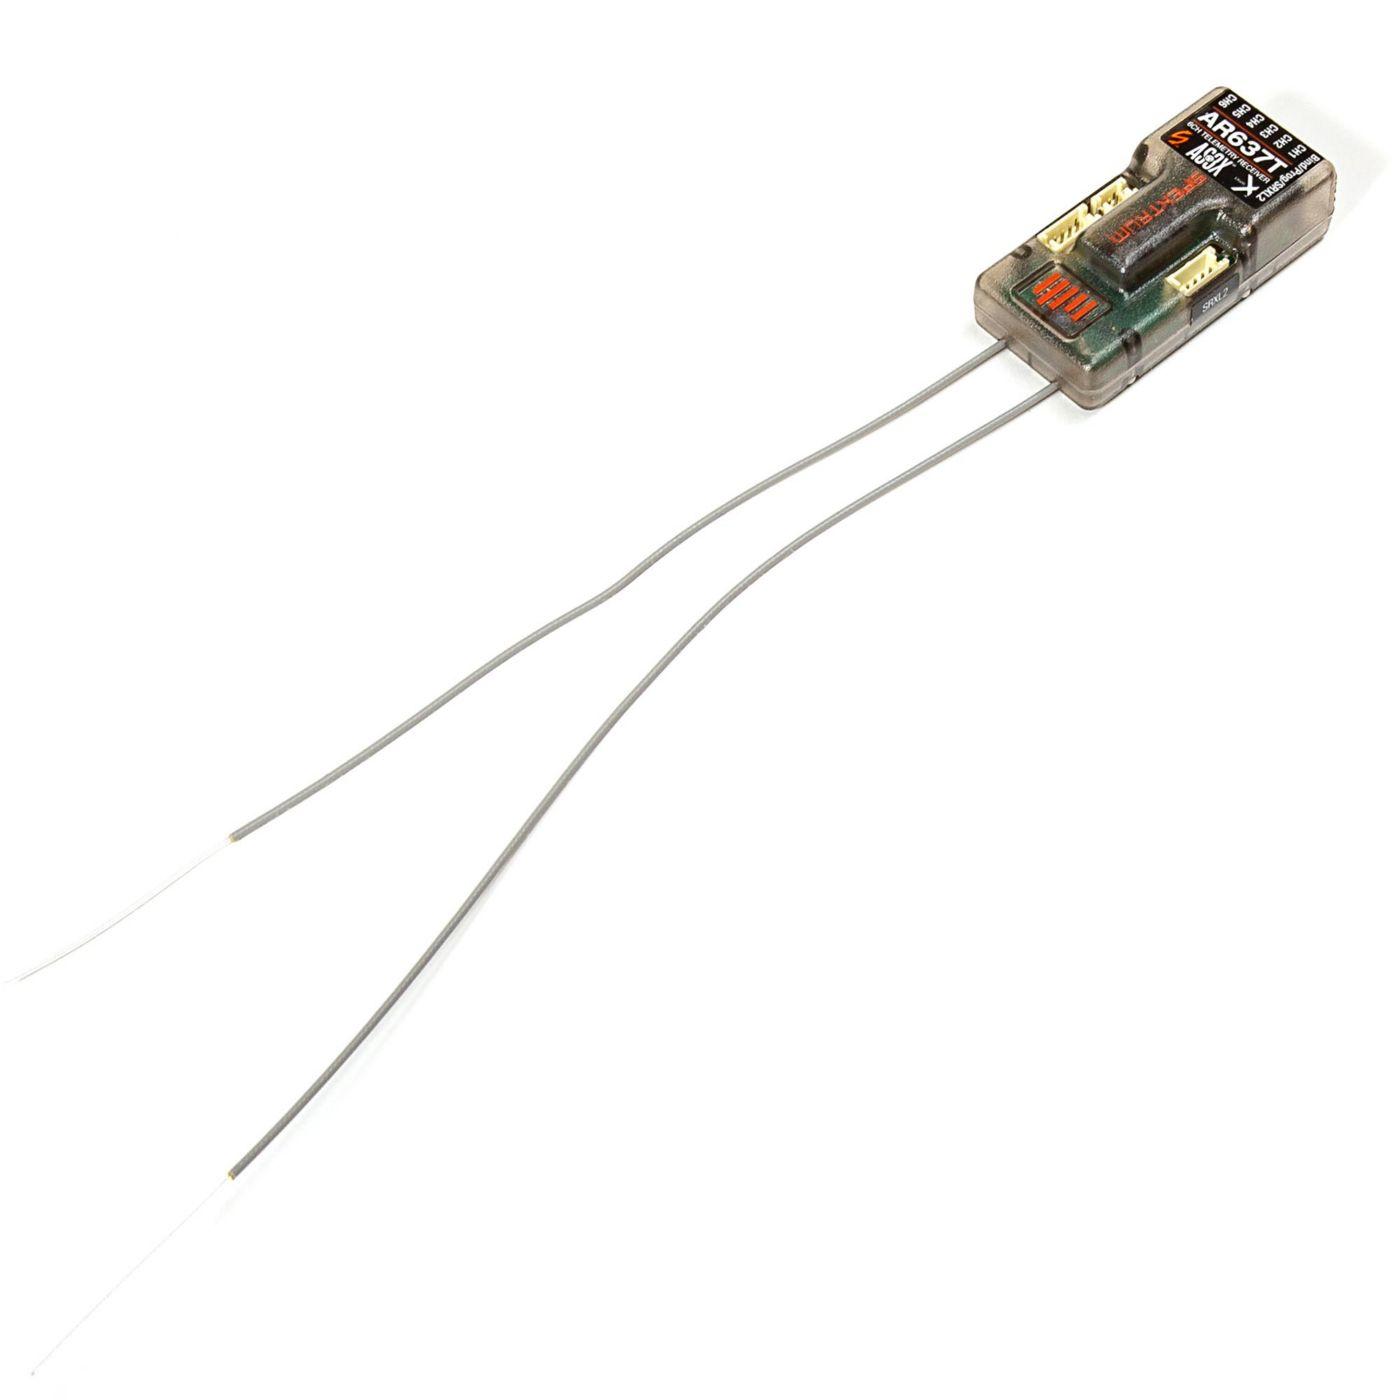 Spektrum AR637T DSMX 6-kanaals AS3X telemetrie ontvanger